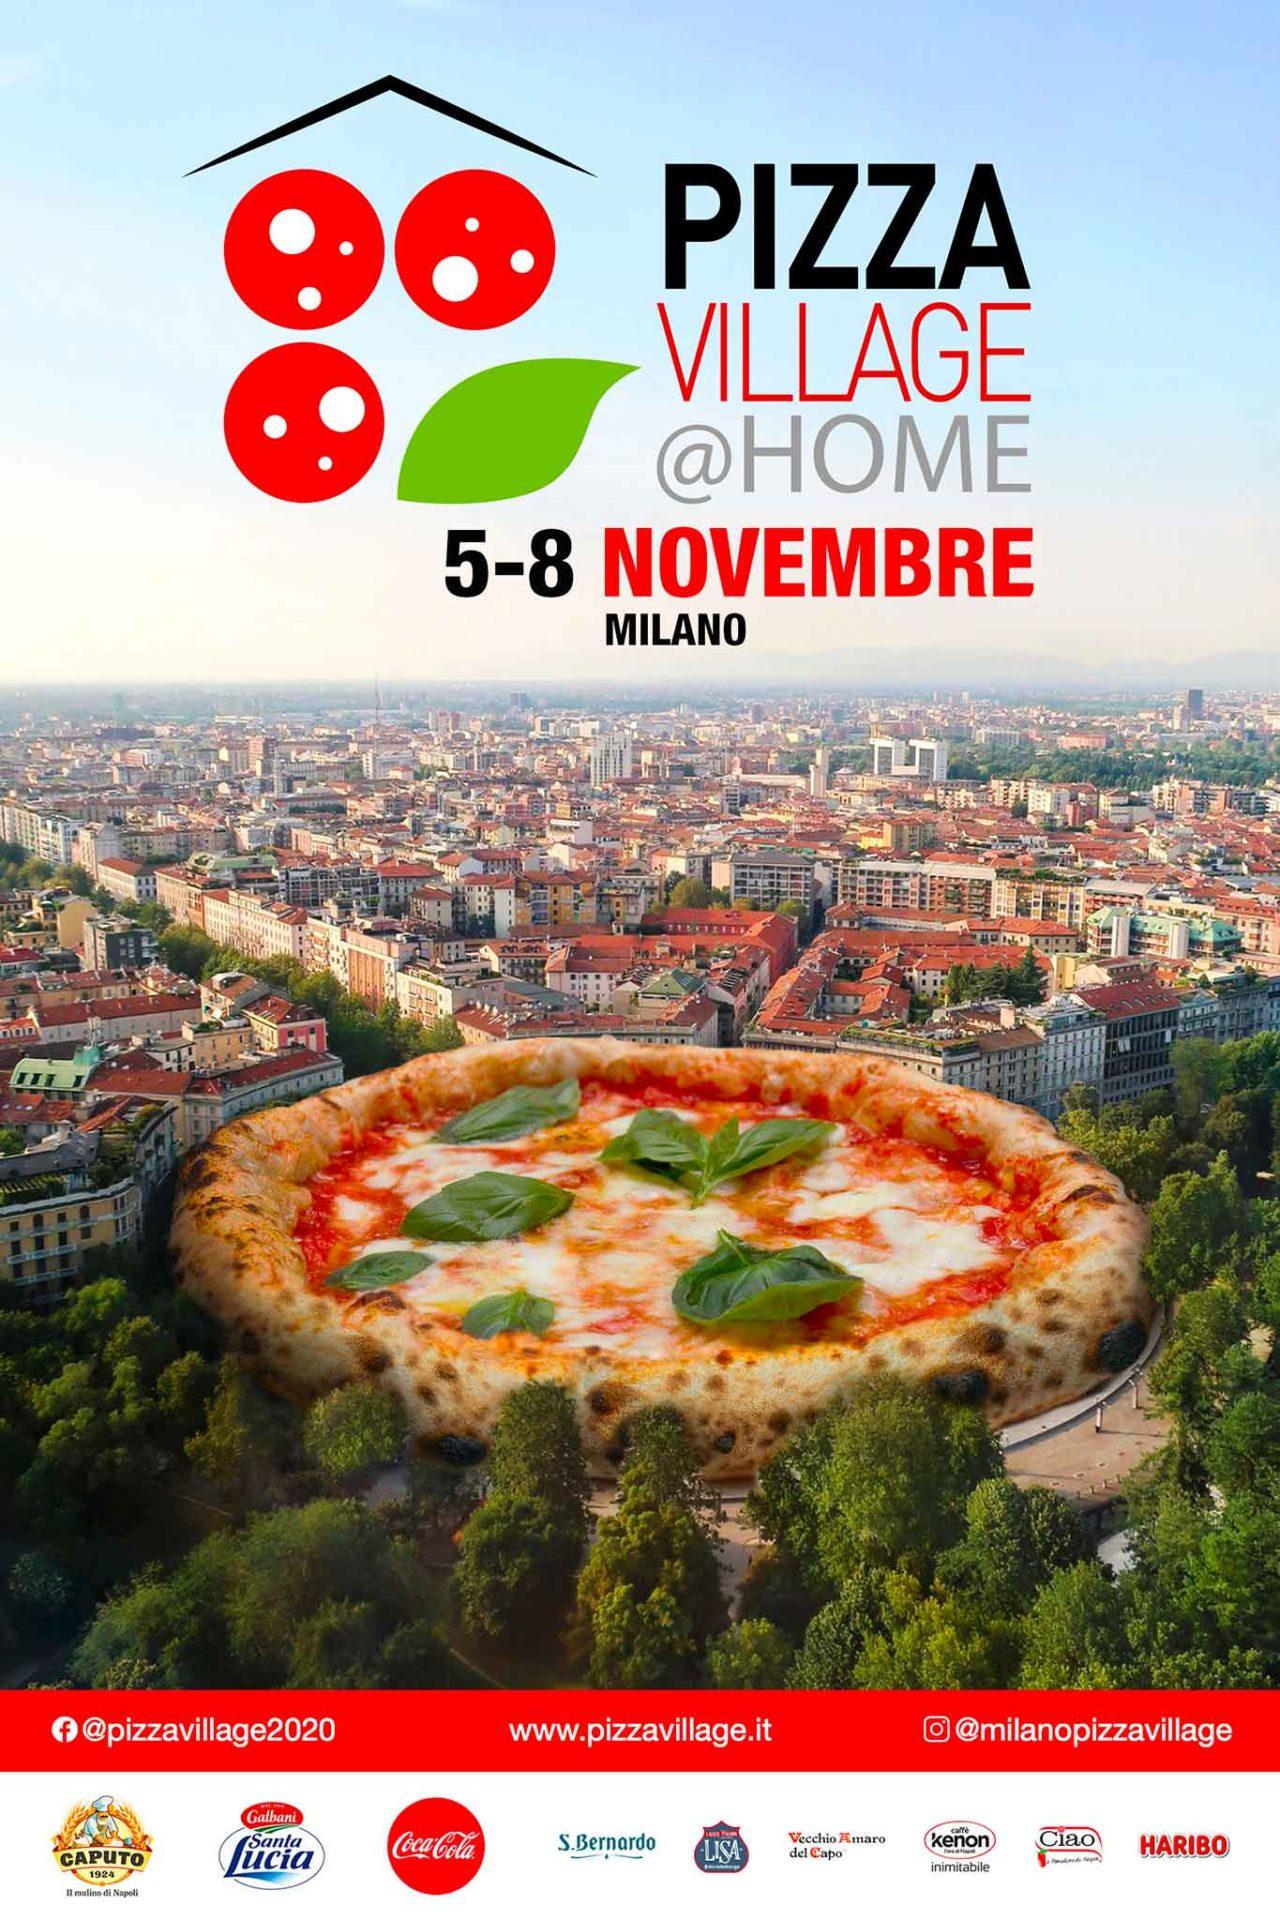 Pizza Village @ Home manifesto